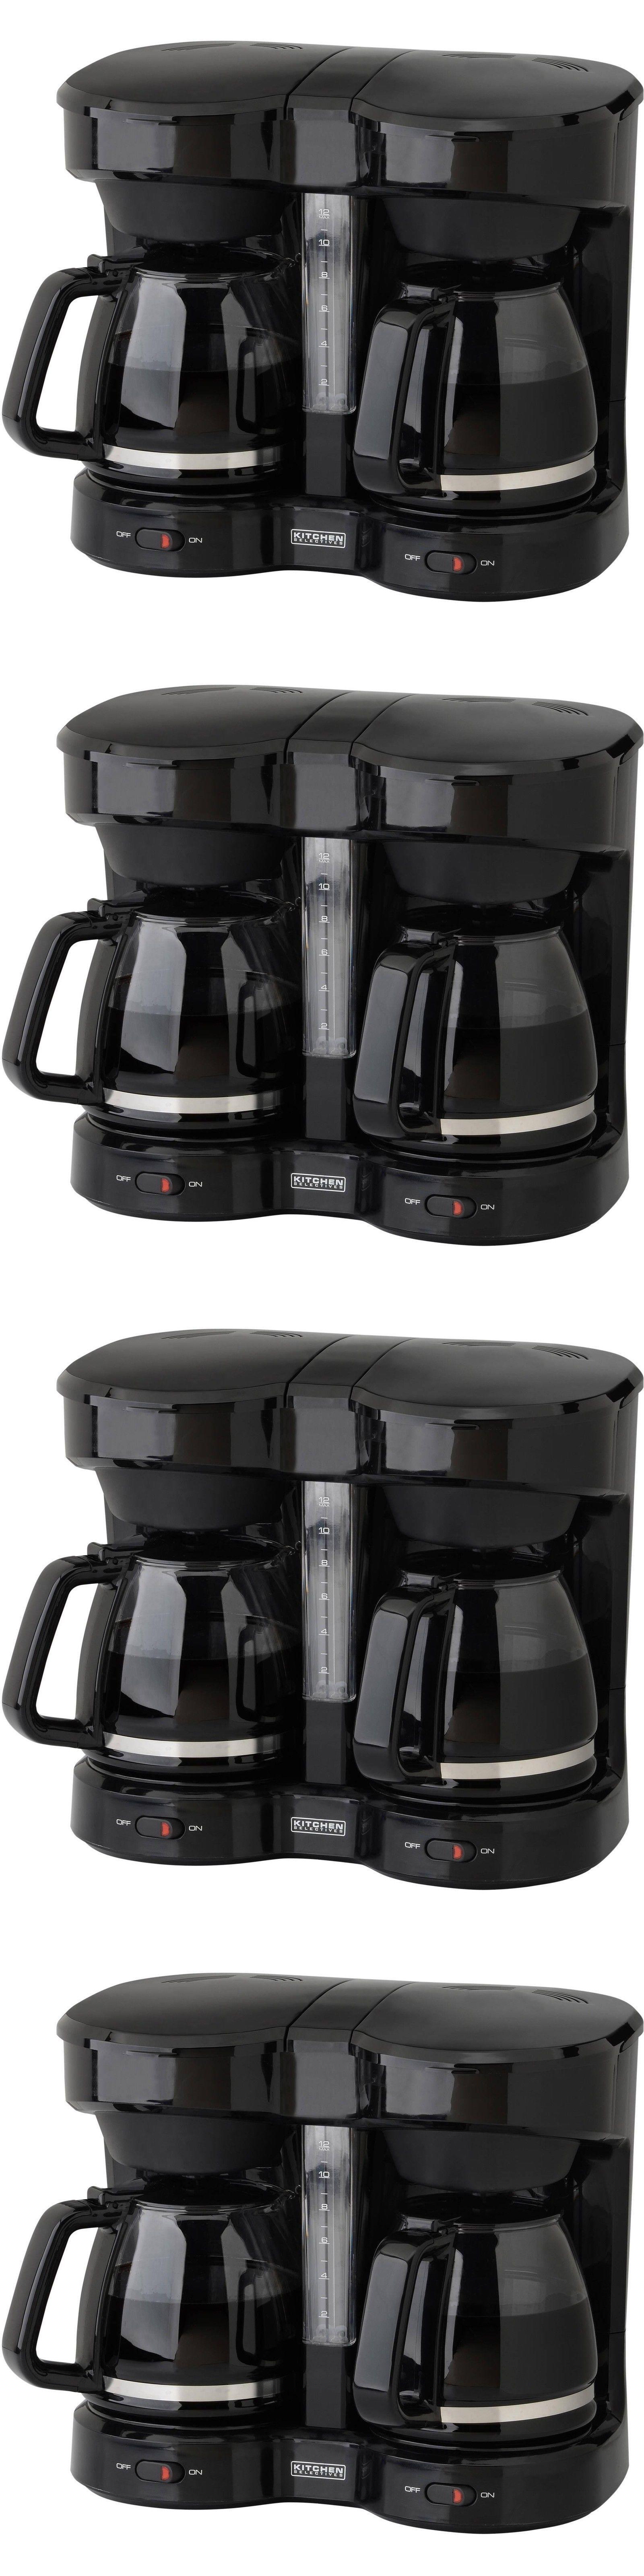 Small Kitchen Appliances Kitchen Selectives Dual Coffee Maker Black